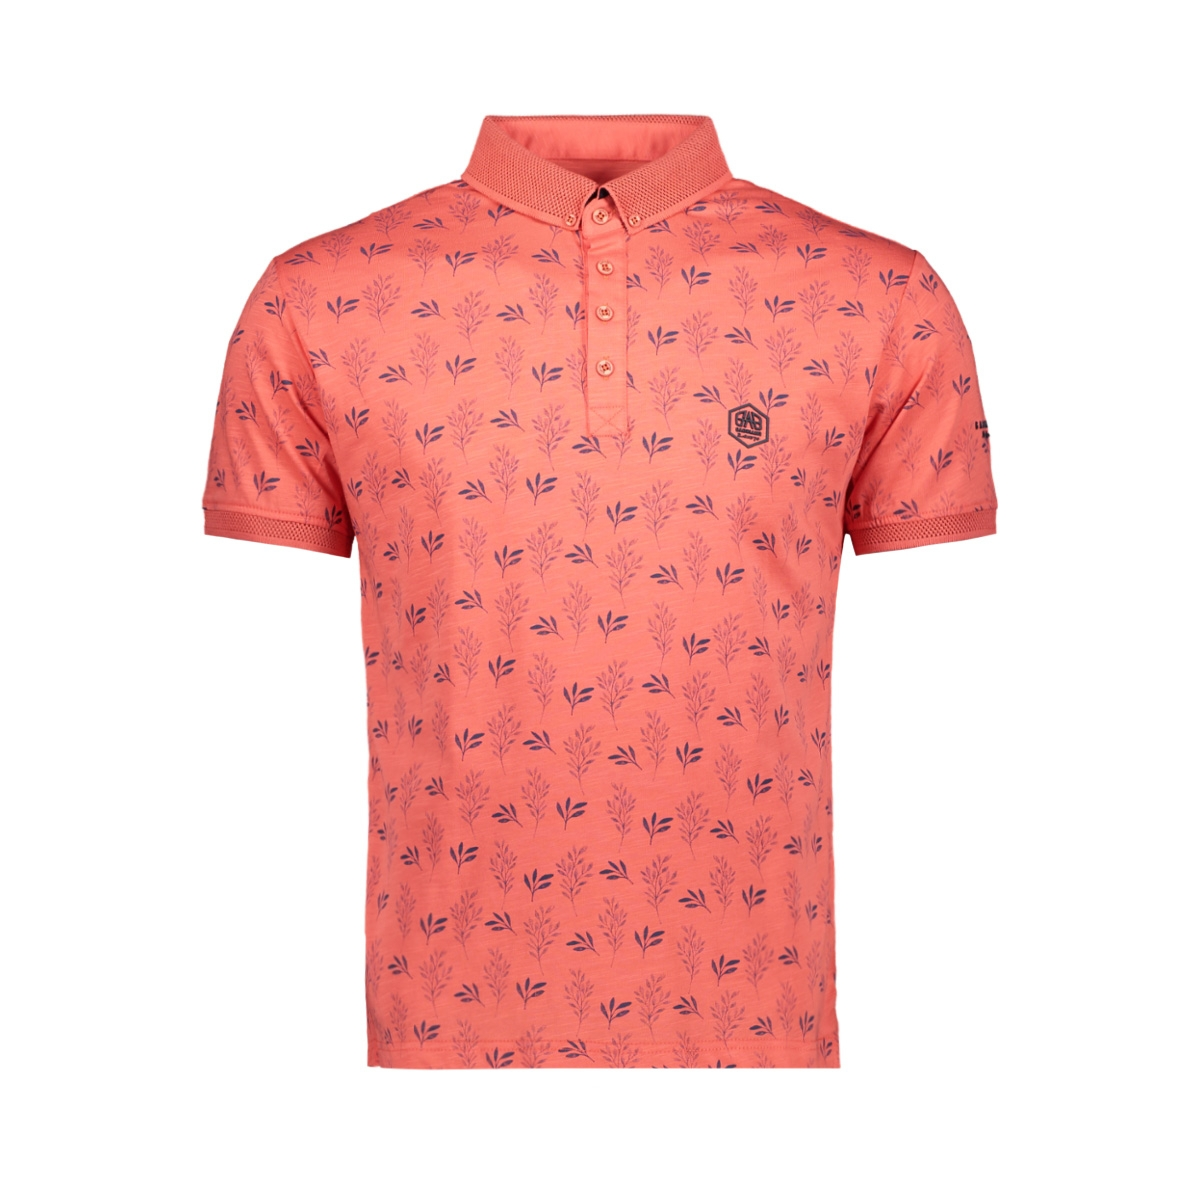 short sleeve polo 22137 gabbiano polo coral